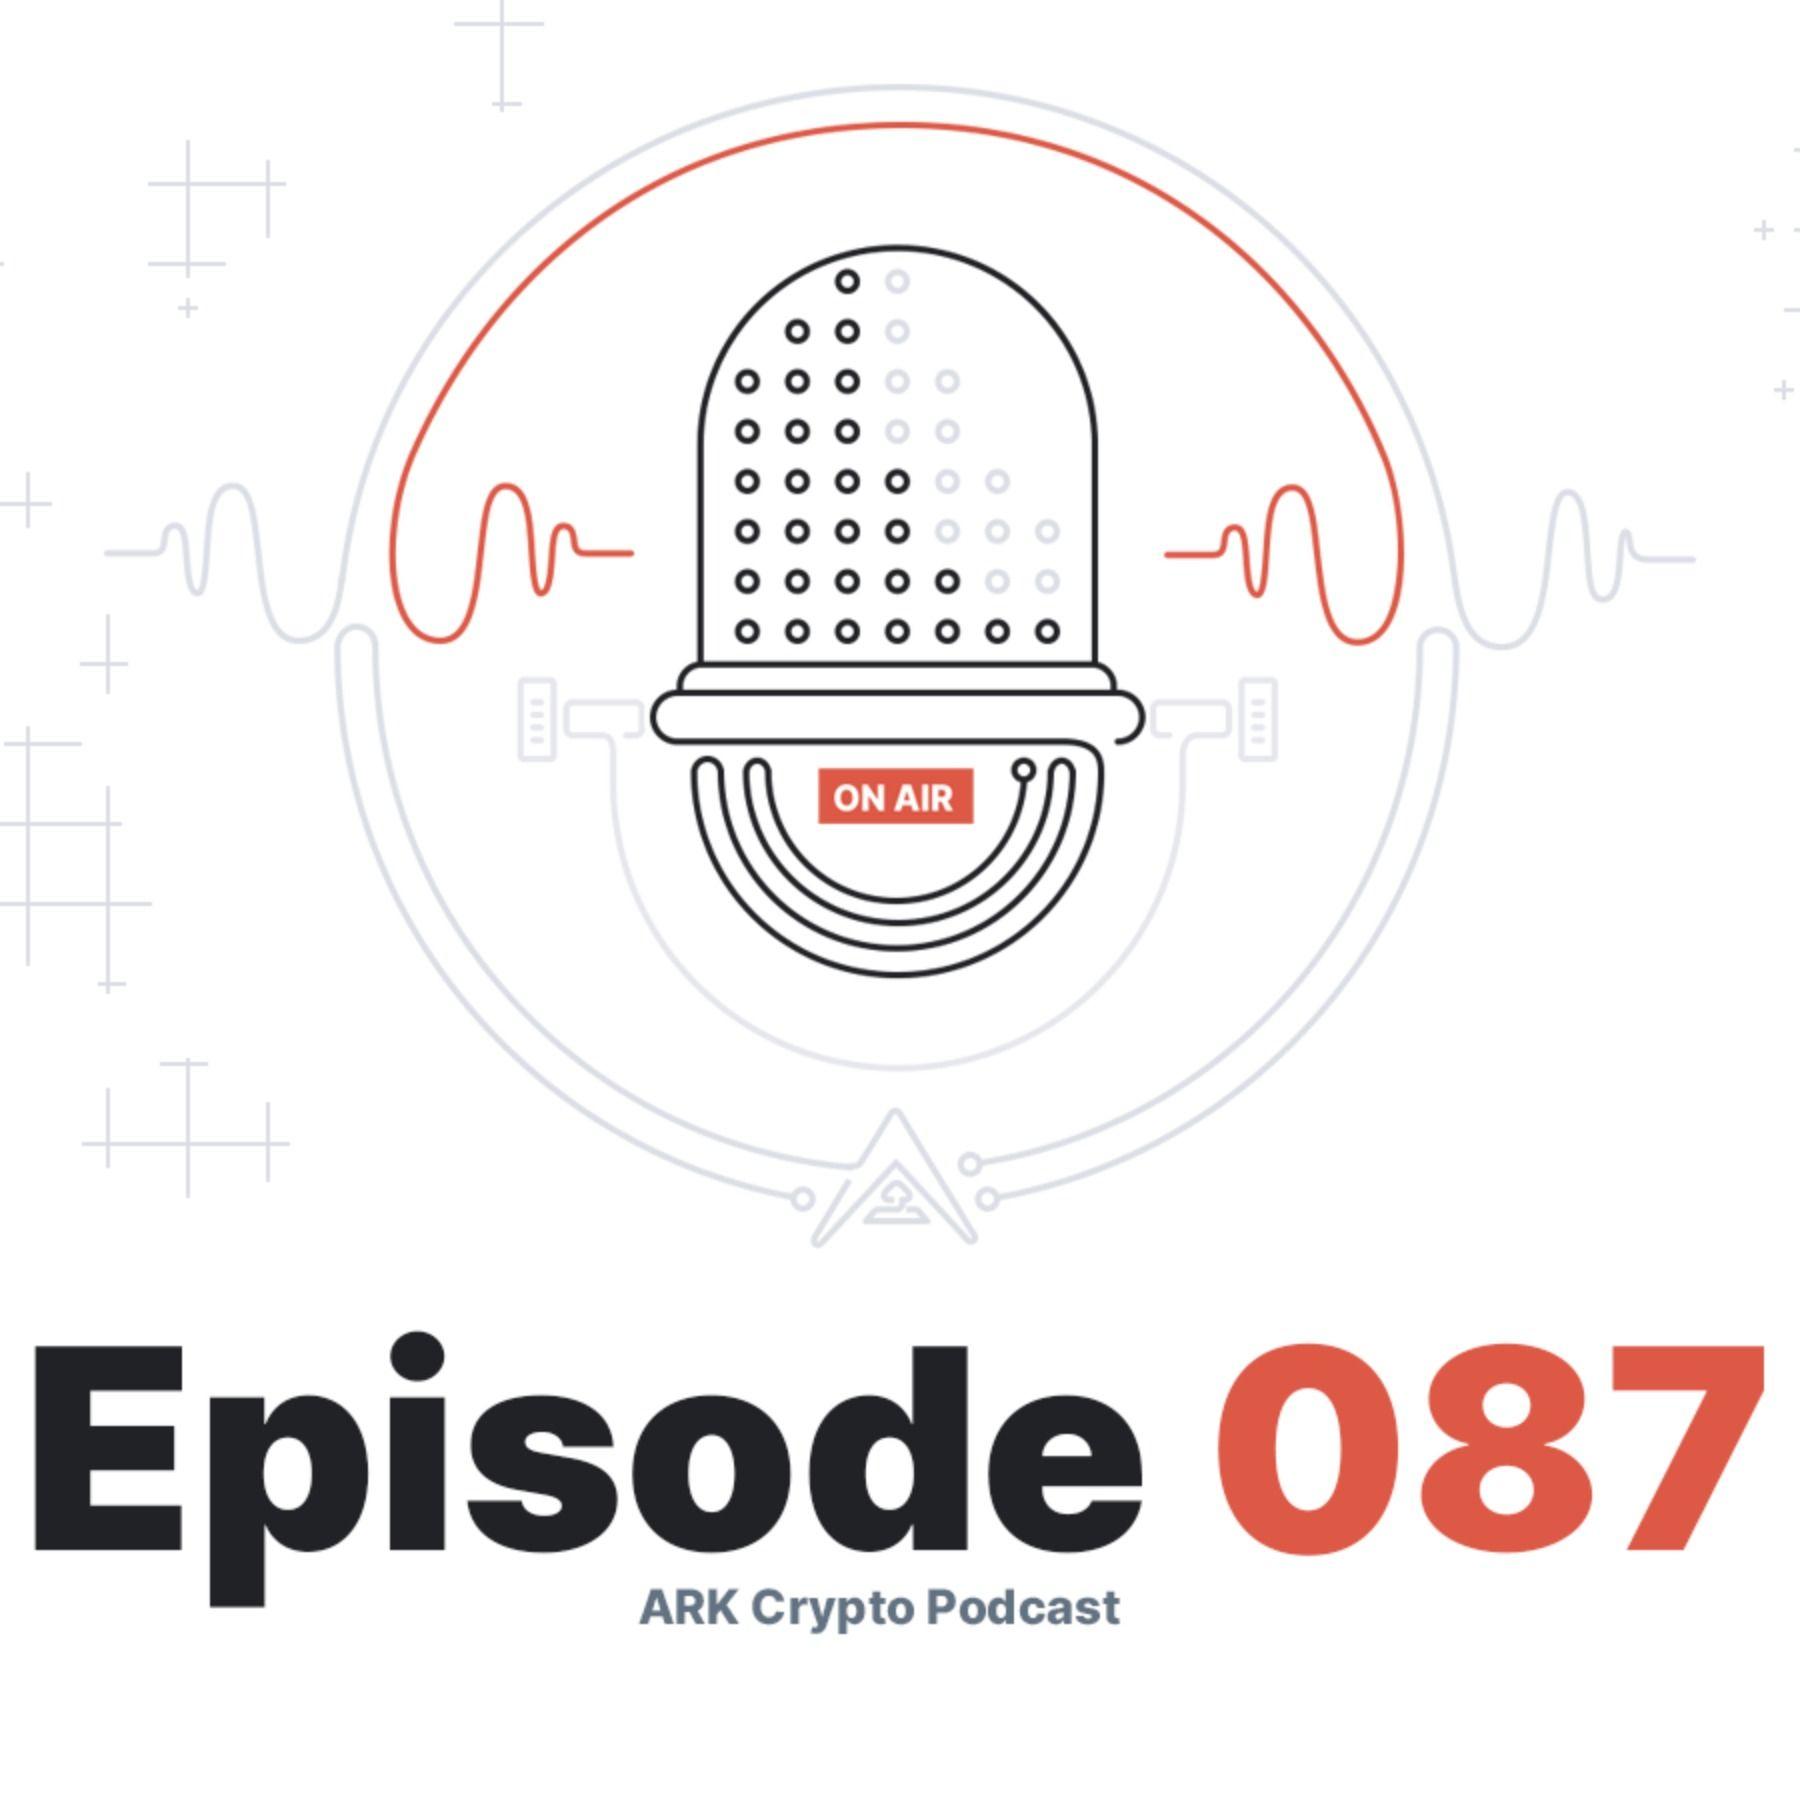 ARK Crypto Podcast #087 - ARK.io Monthly Update July 2020